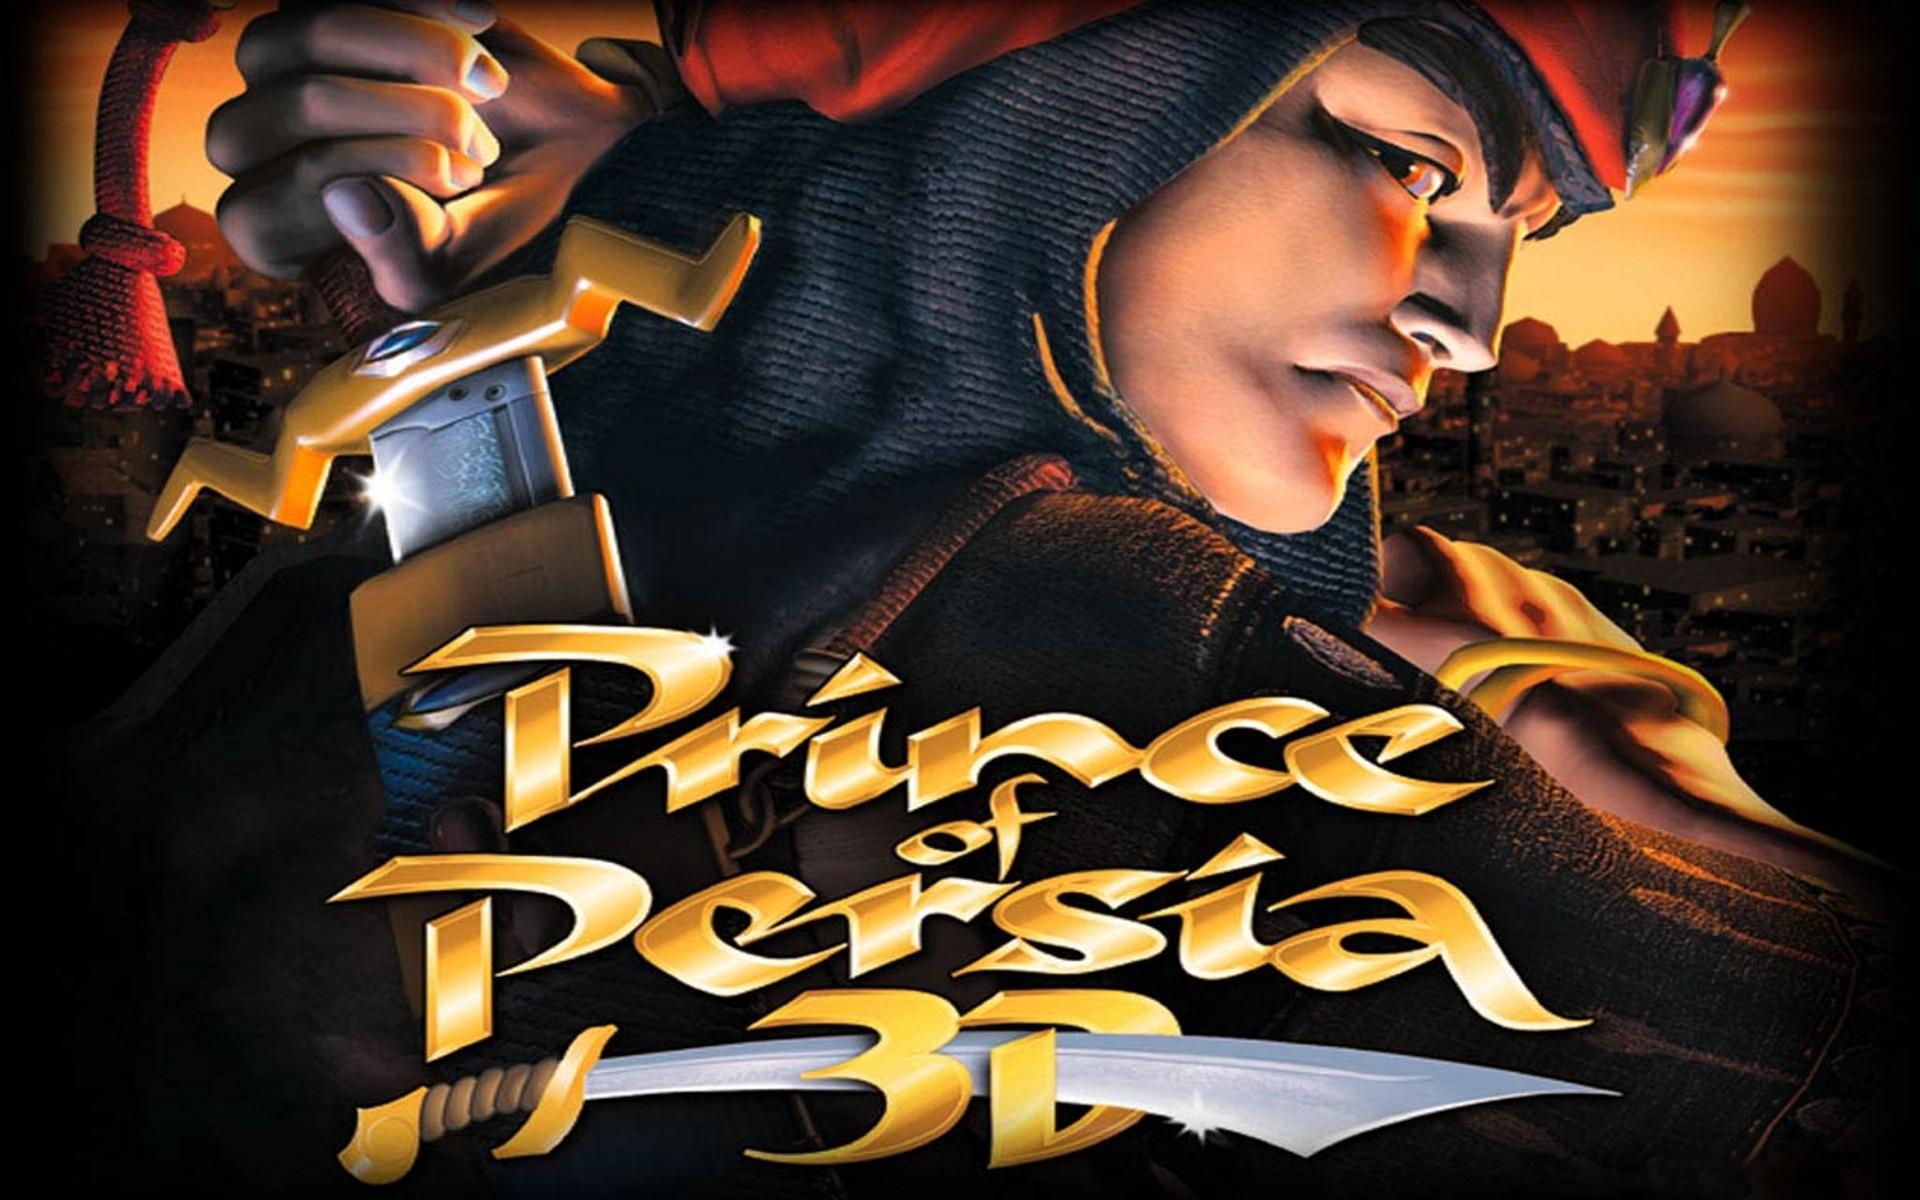 Prince of persia hantai 3d image porn tube